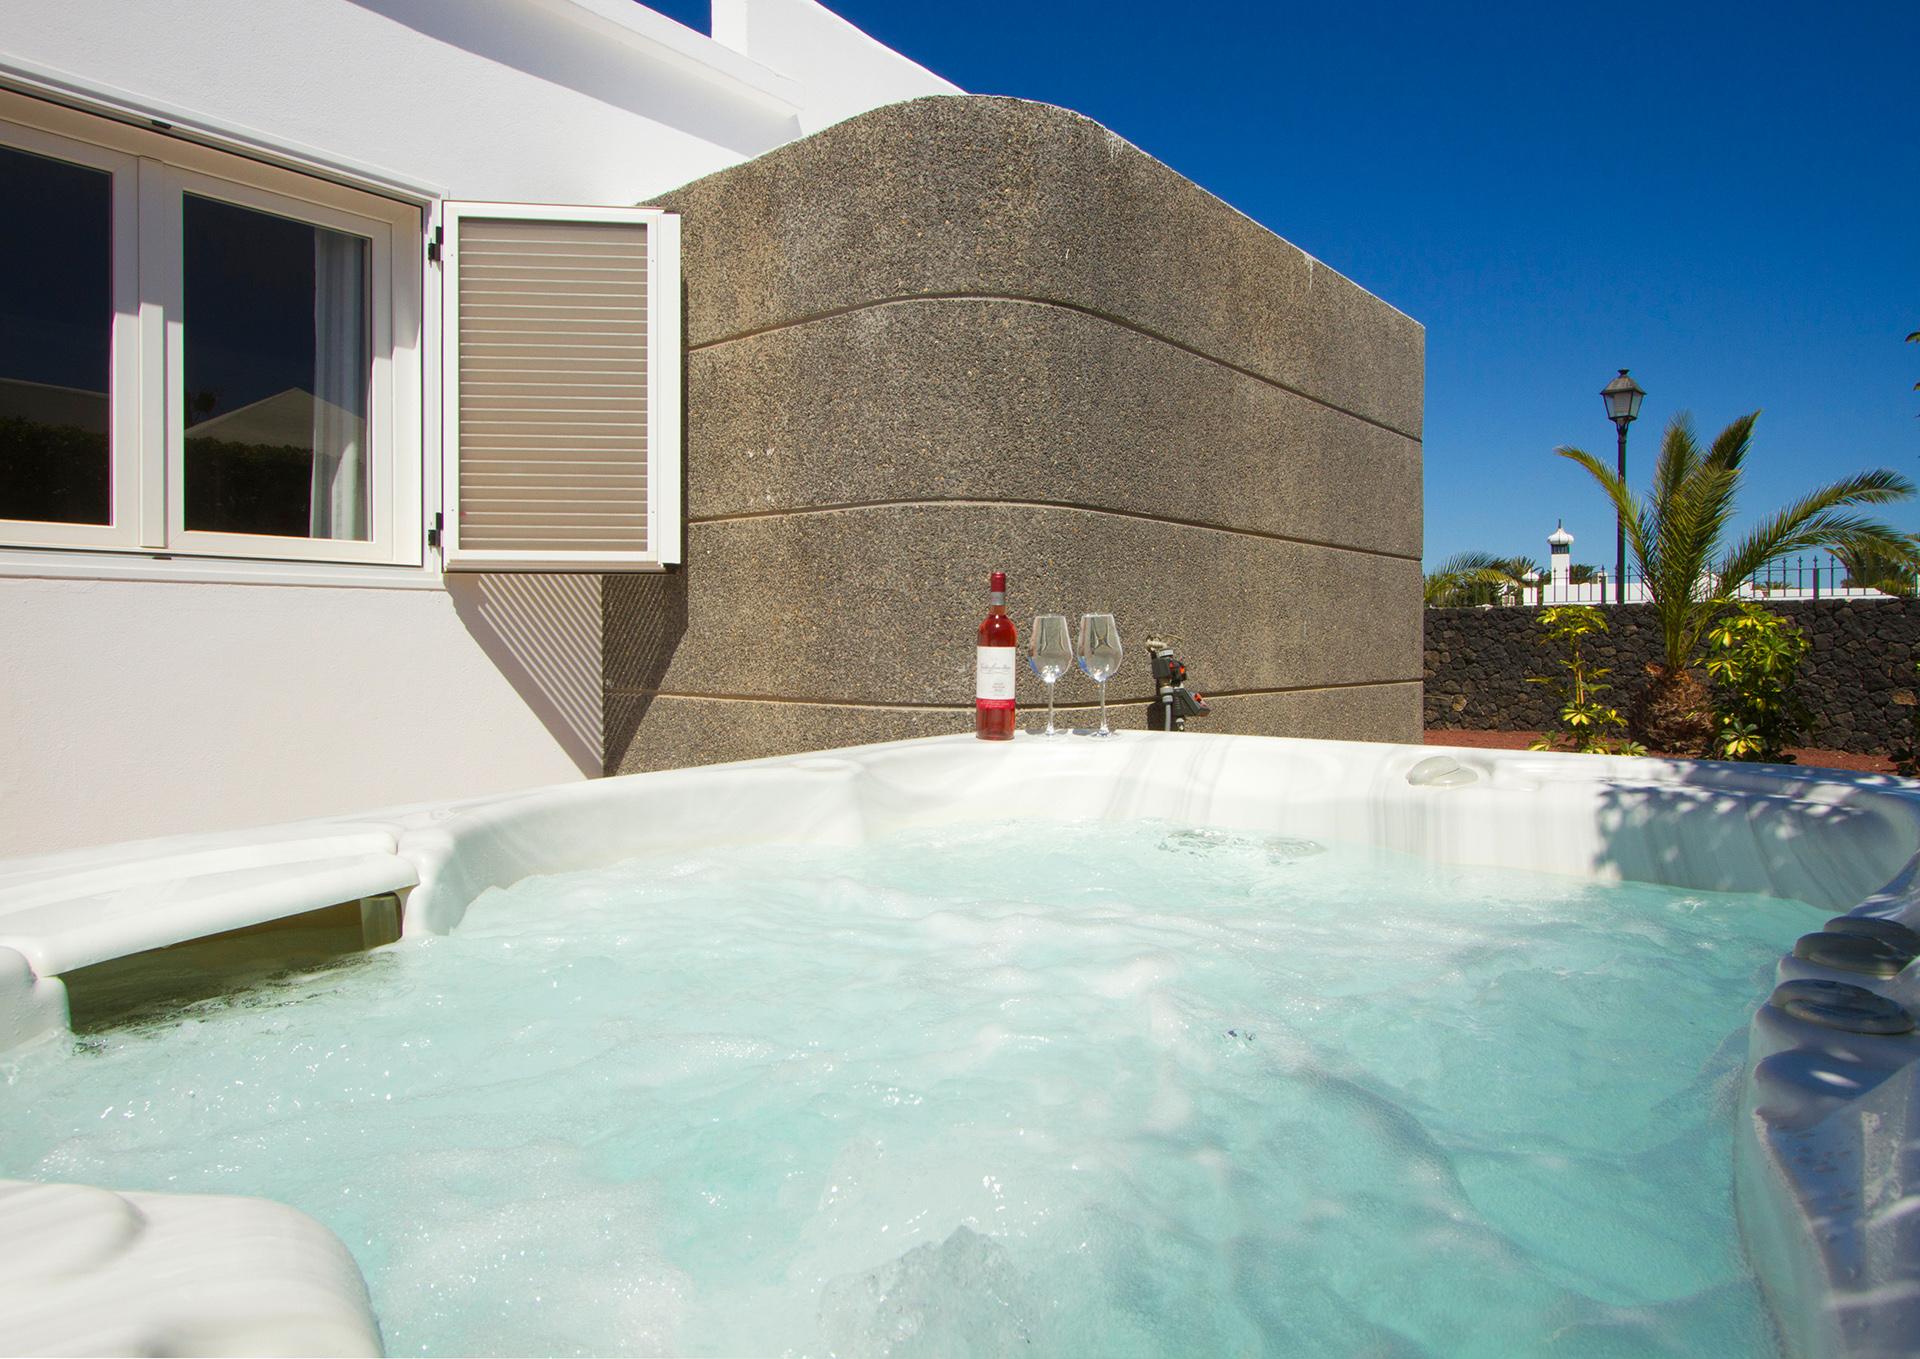 Ferienhaus Lanzarote Whirlpool